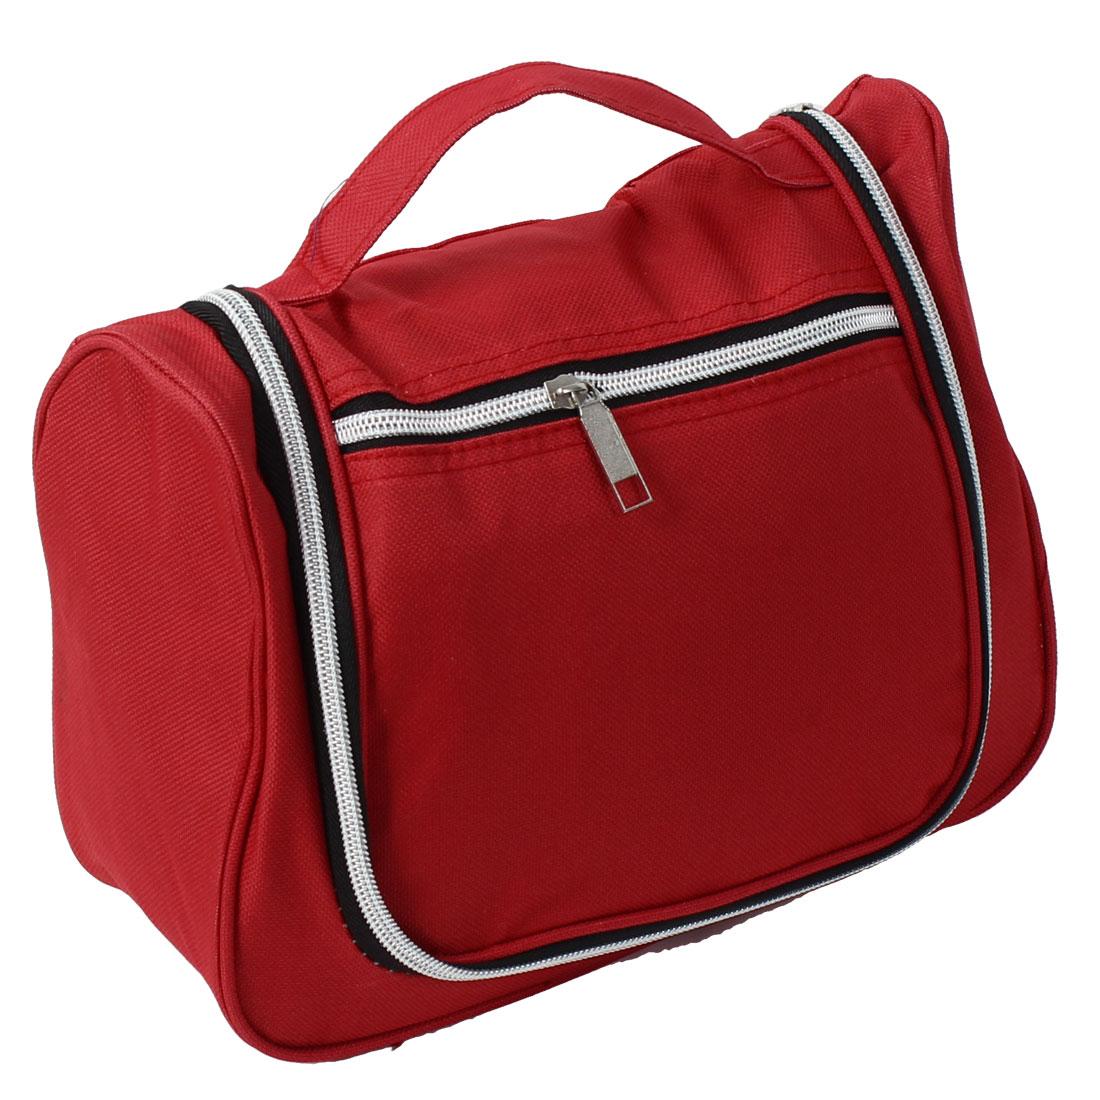 Travel Toiletry Makeup Case Wash Storage Bag Organizer Red